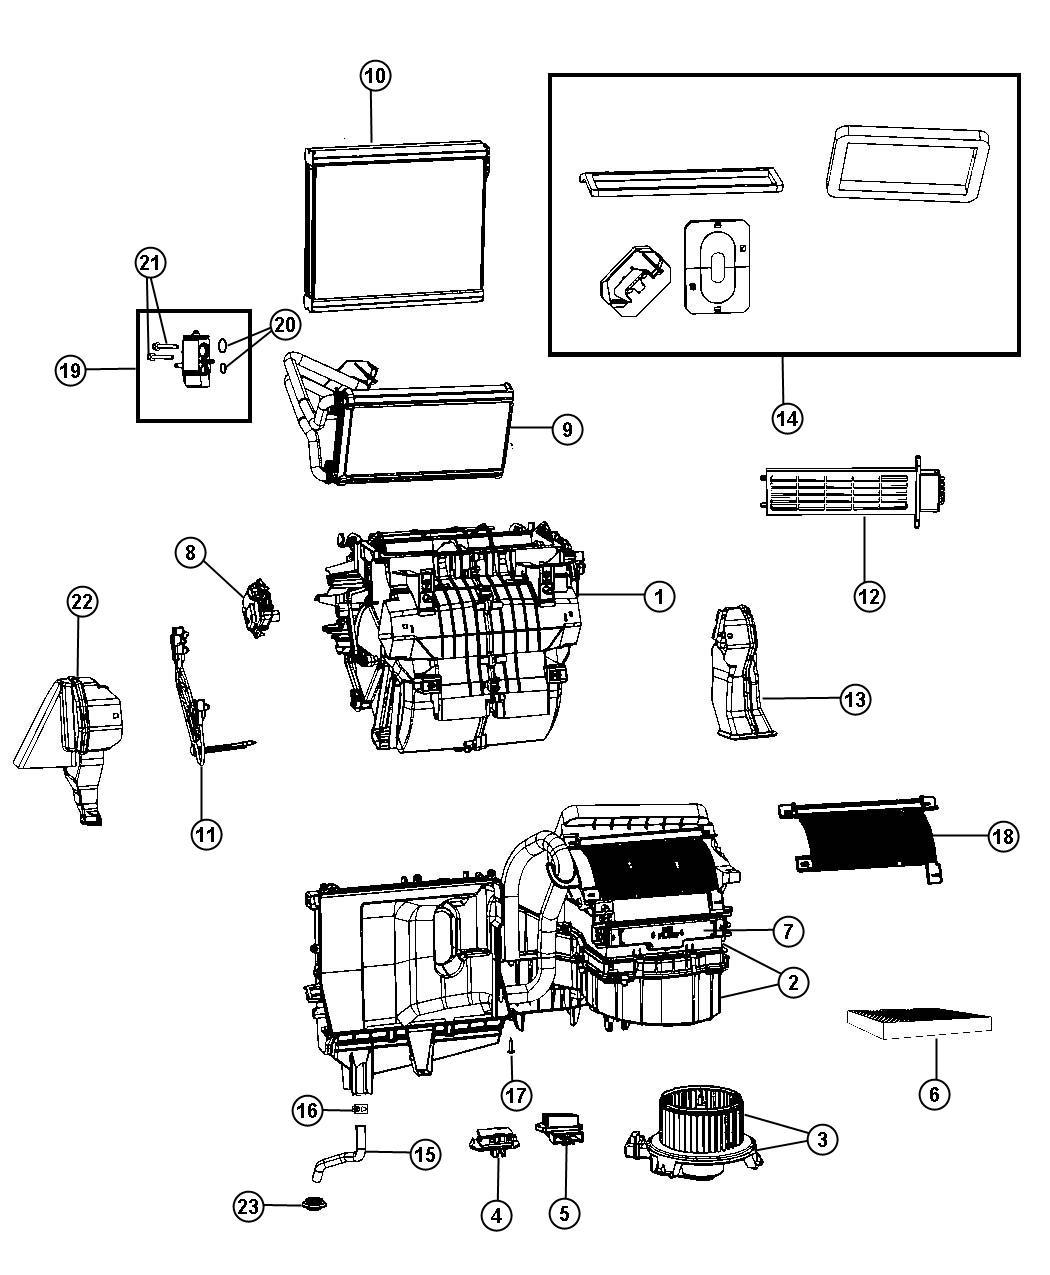 Dodge Journey Evaporator Air Conditioning Export